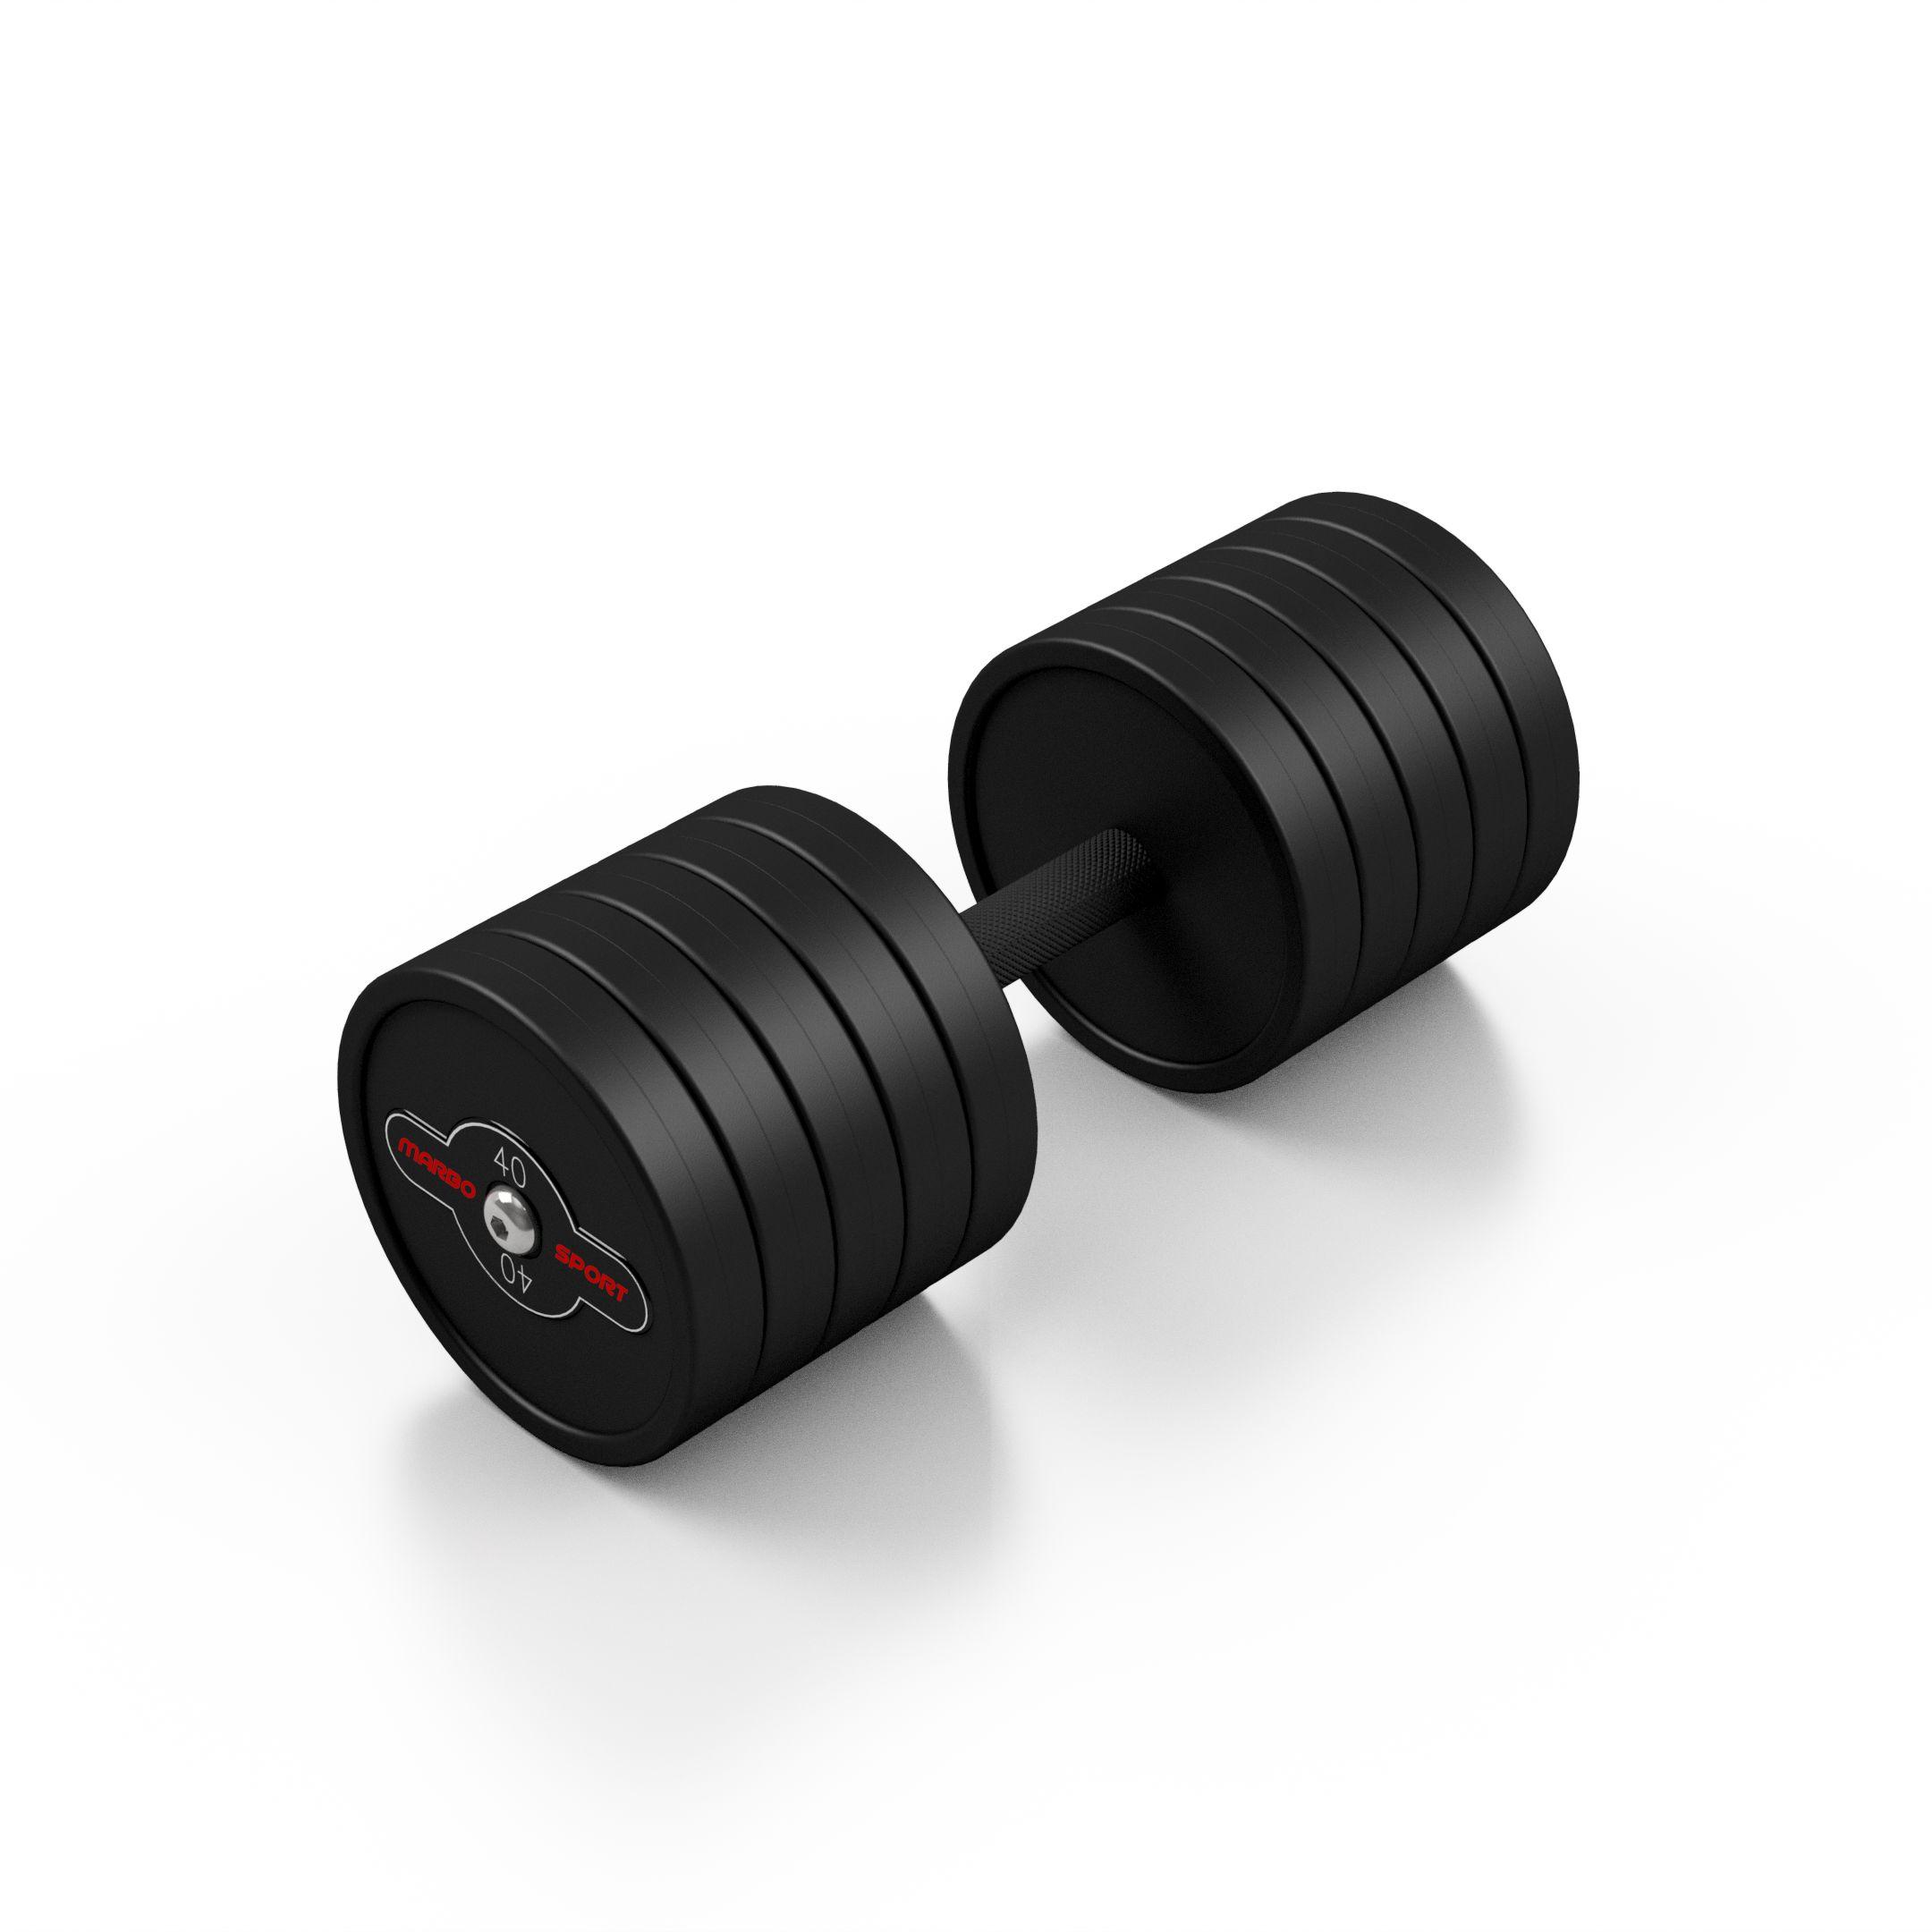 Hantla stalowa gumowana 40 kg czarny mat - Marbo Sport - 40 kg